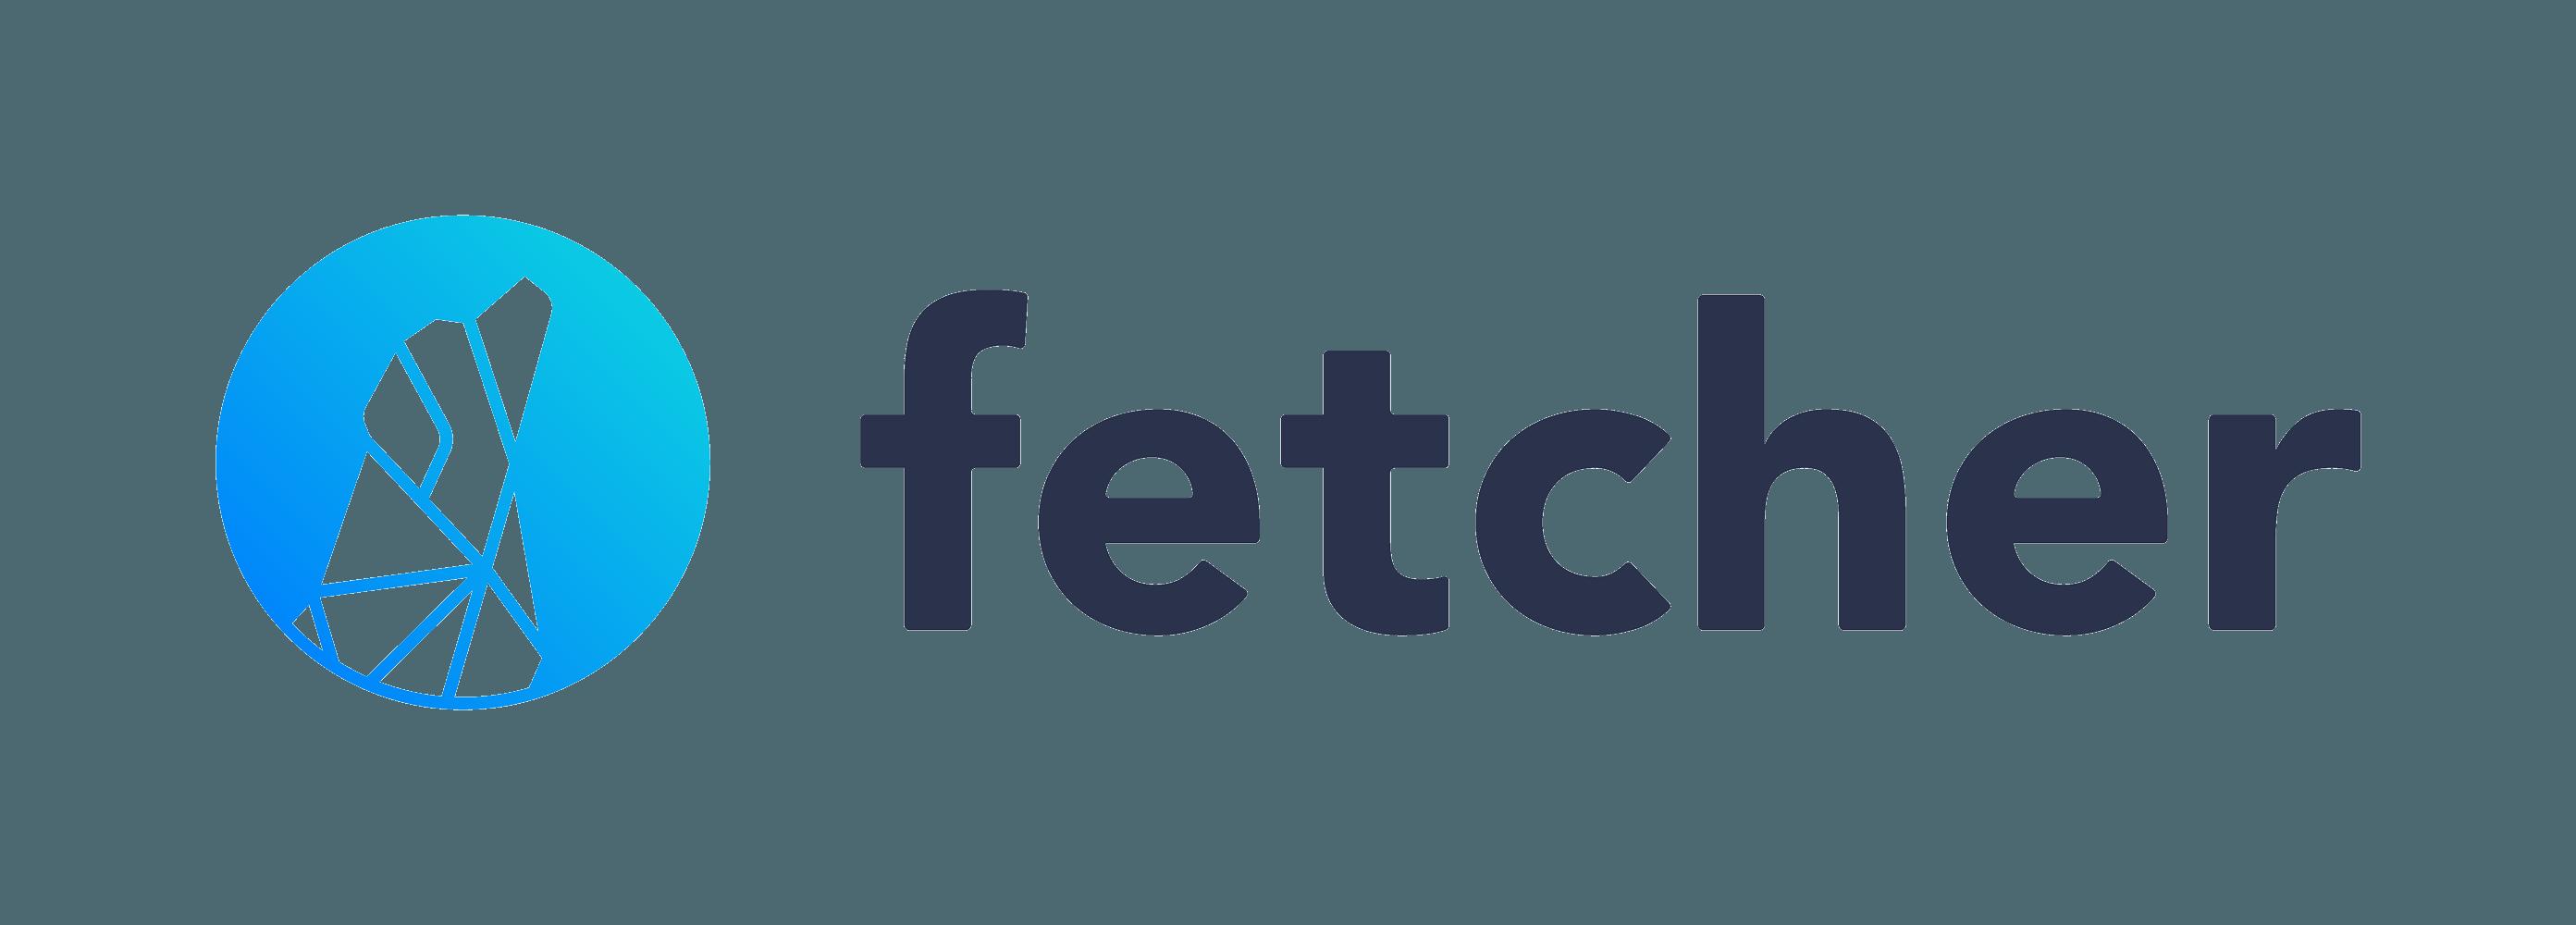 fetcher-logo_primary_color